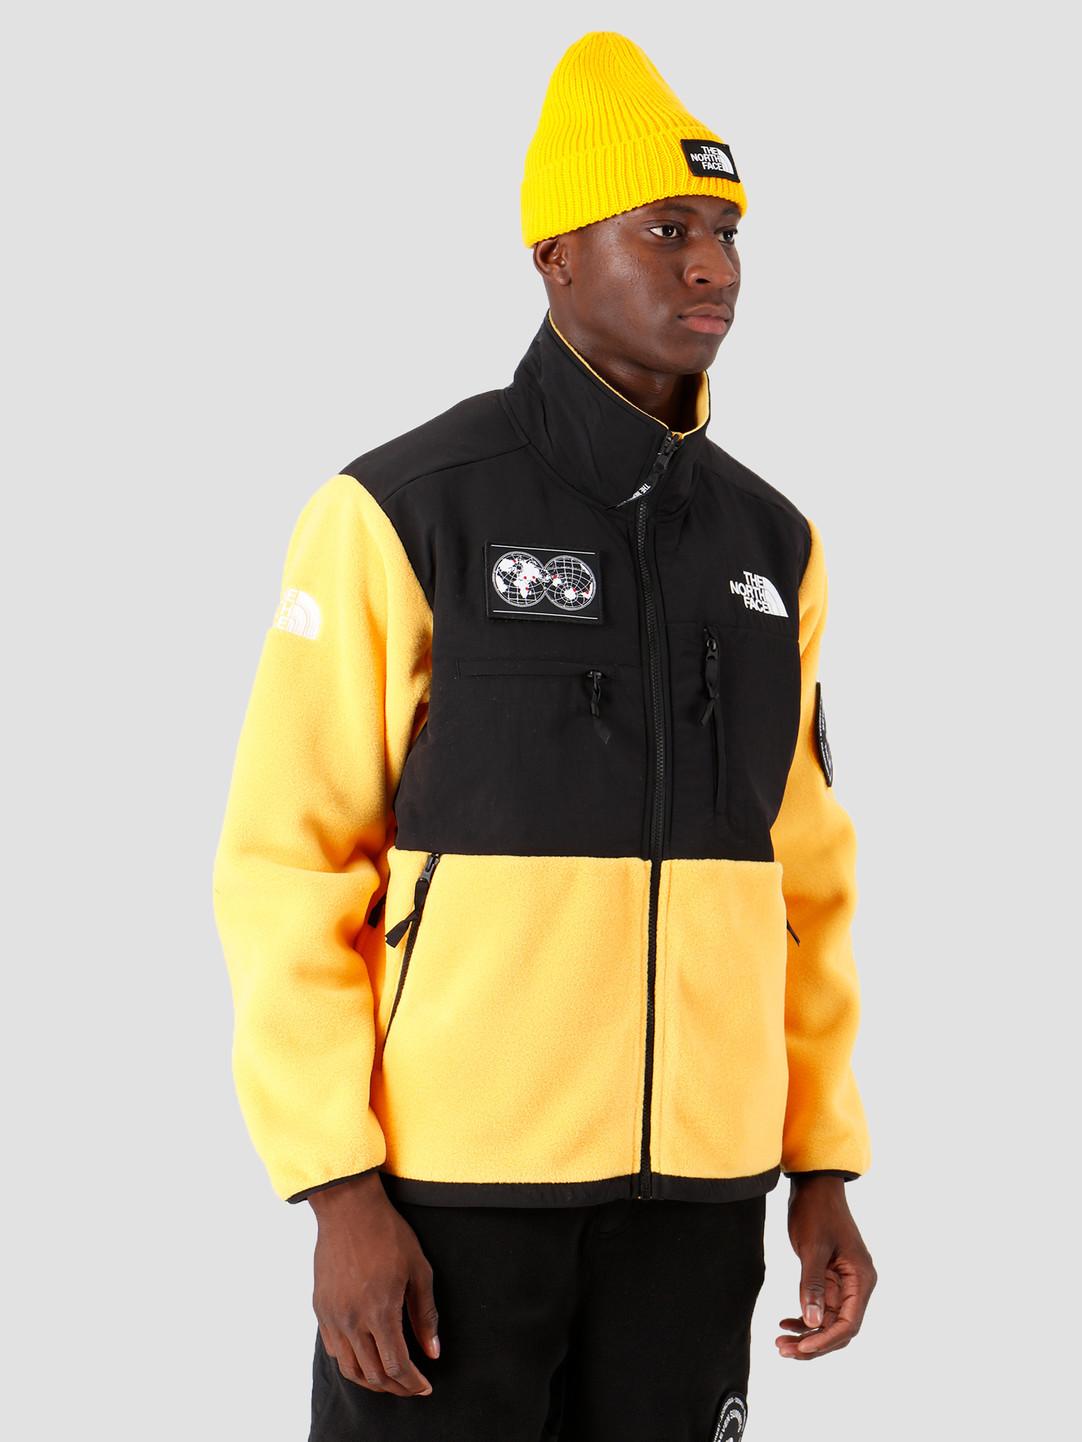 The North Face The North Face 7Se 95 Retro Denali Jacket Tnf Yellow Nf0A3Xen70M1